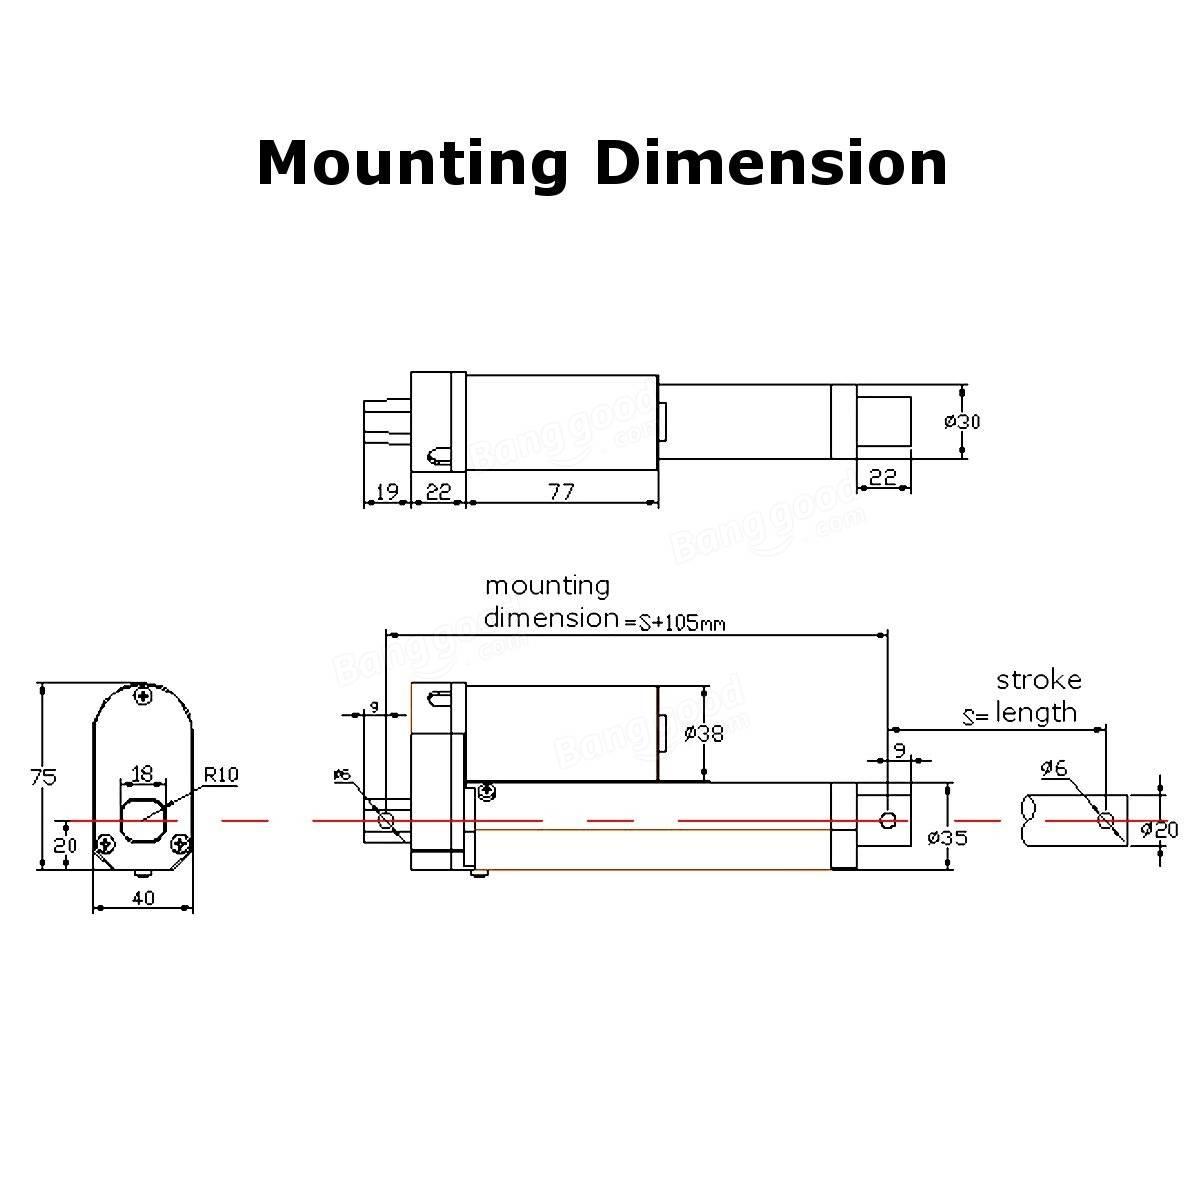 viper alarm 350hv wiring diagram best house 211hv linear actuator ~ elsalvadorla